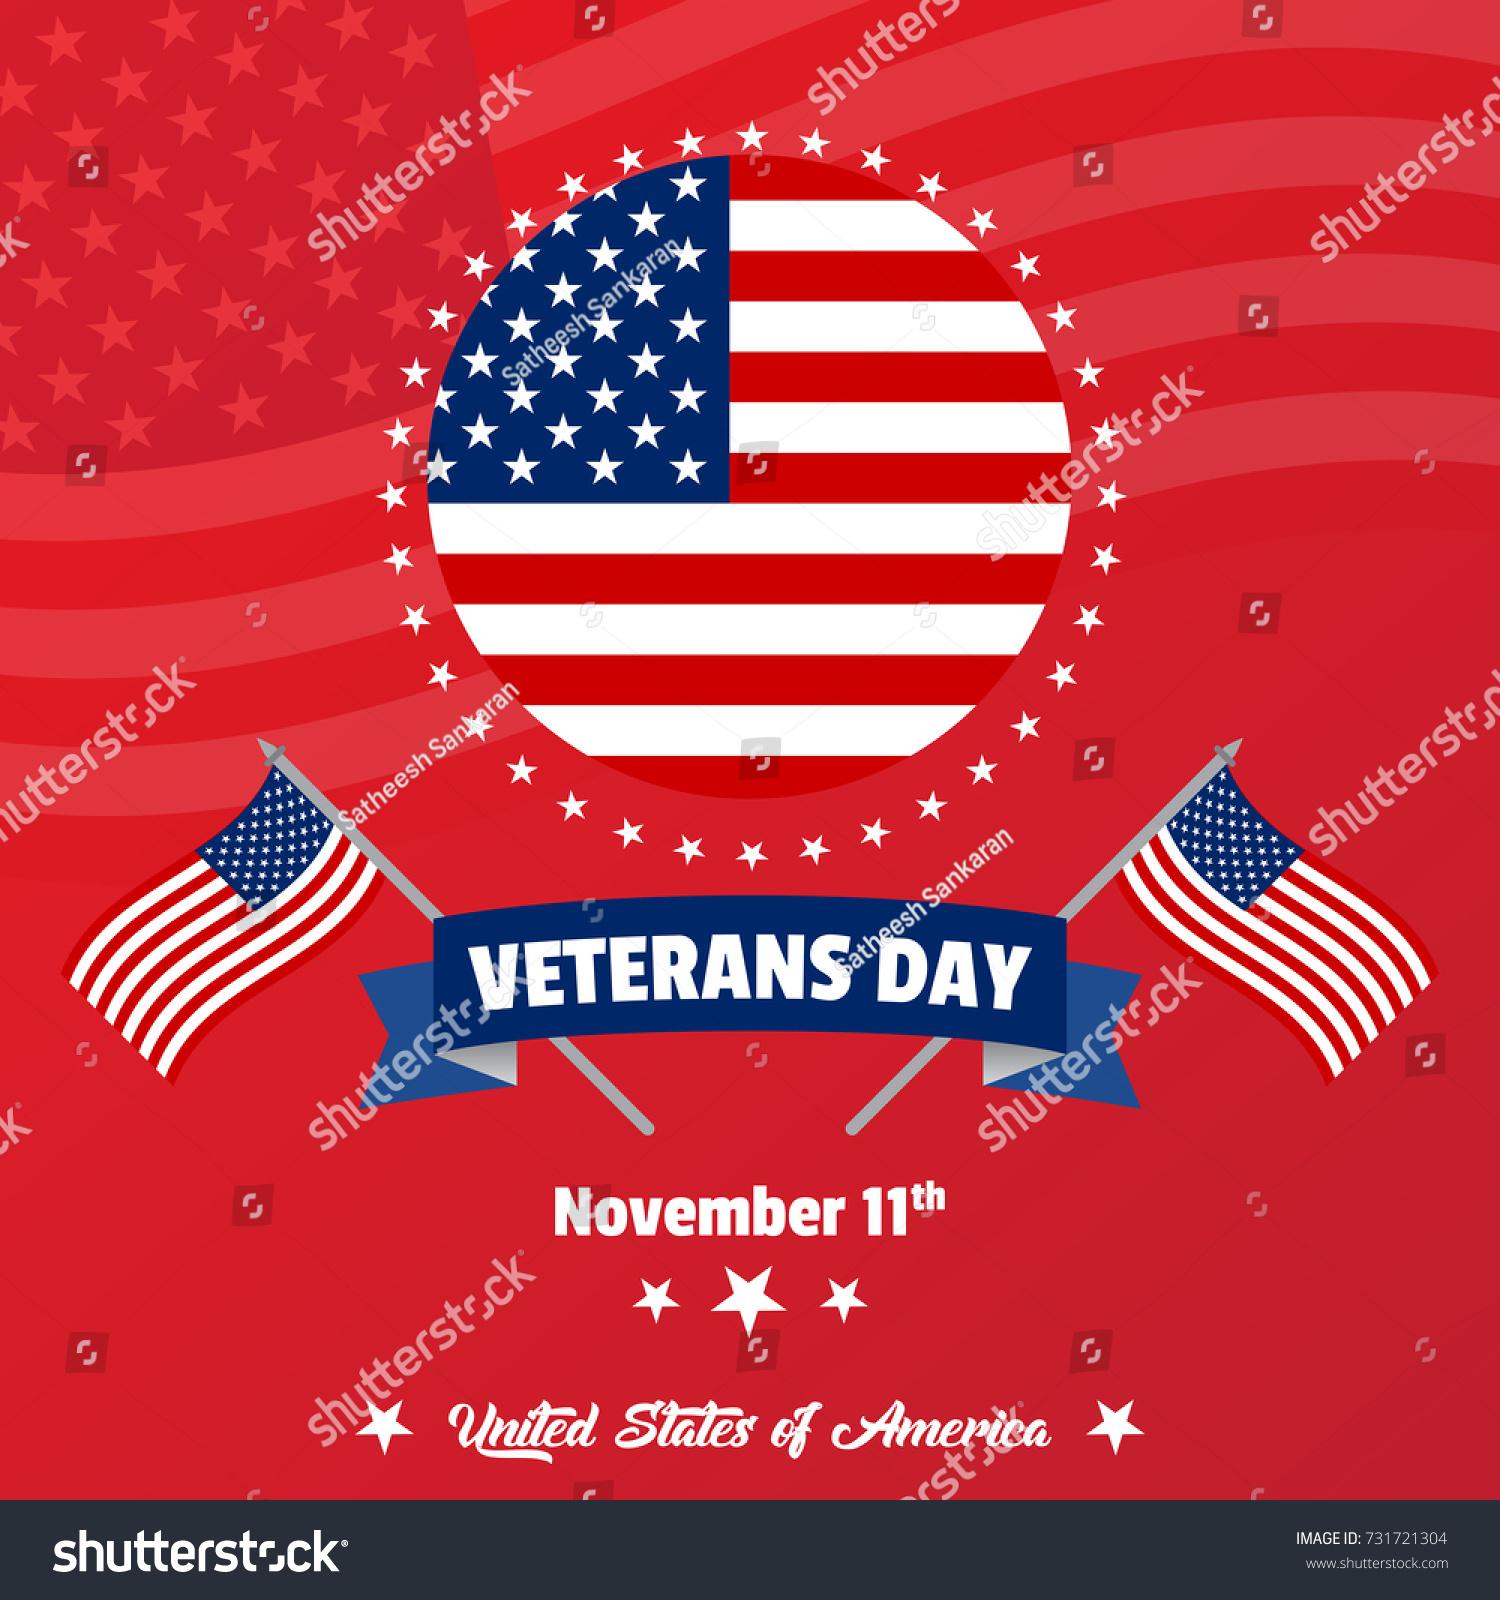 Creative veterans day illustration usa flag stock vector 731721304 creative veterans day illustration with usa flag celebrating american war veterans can be used kristyandbryce Choice Image